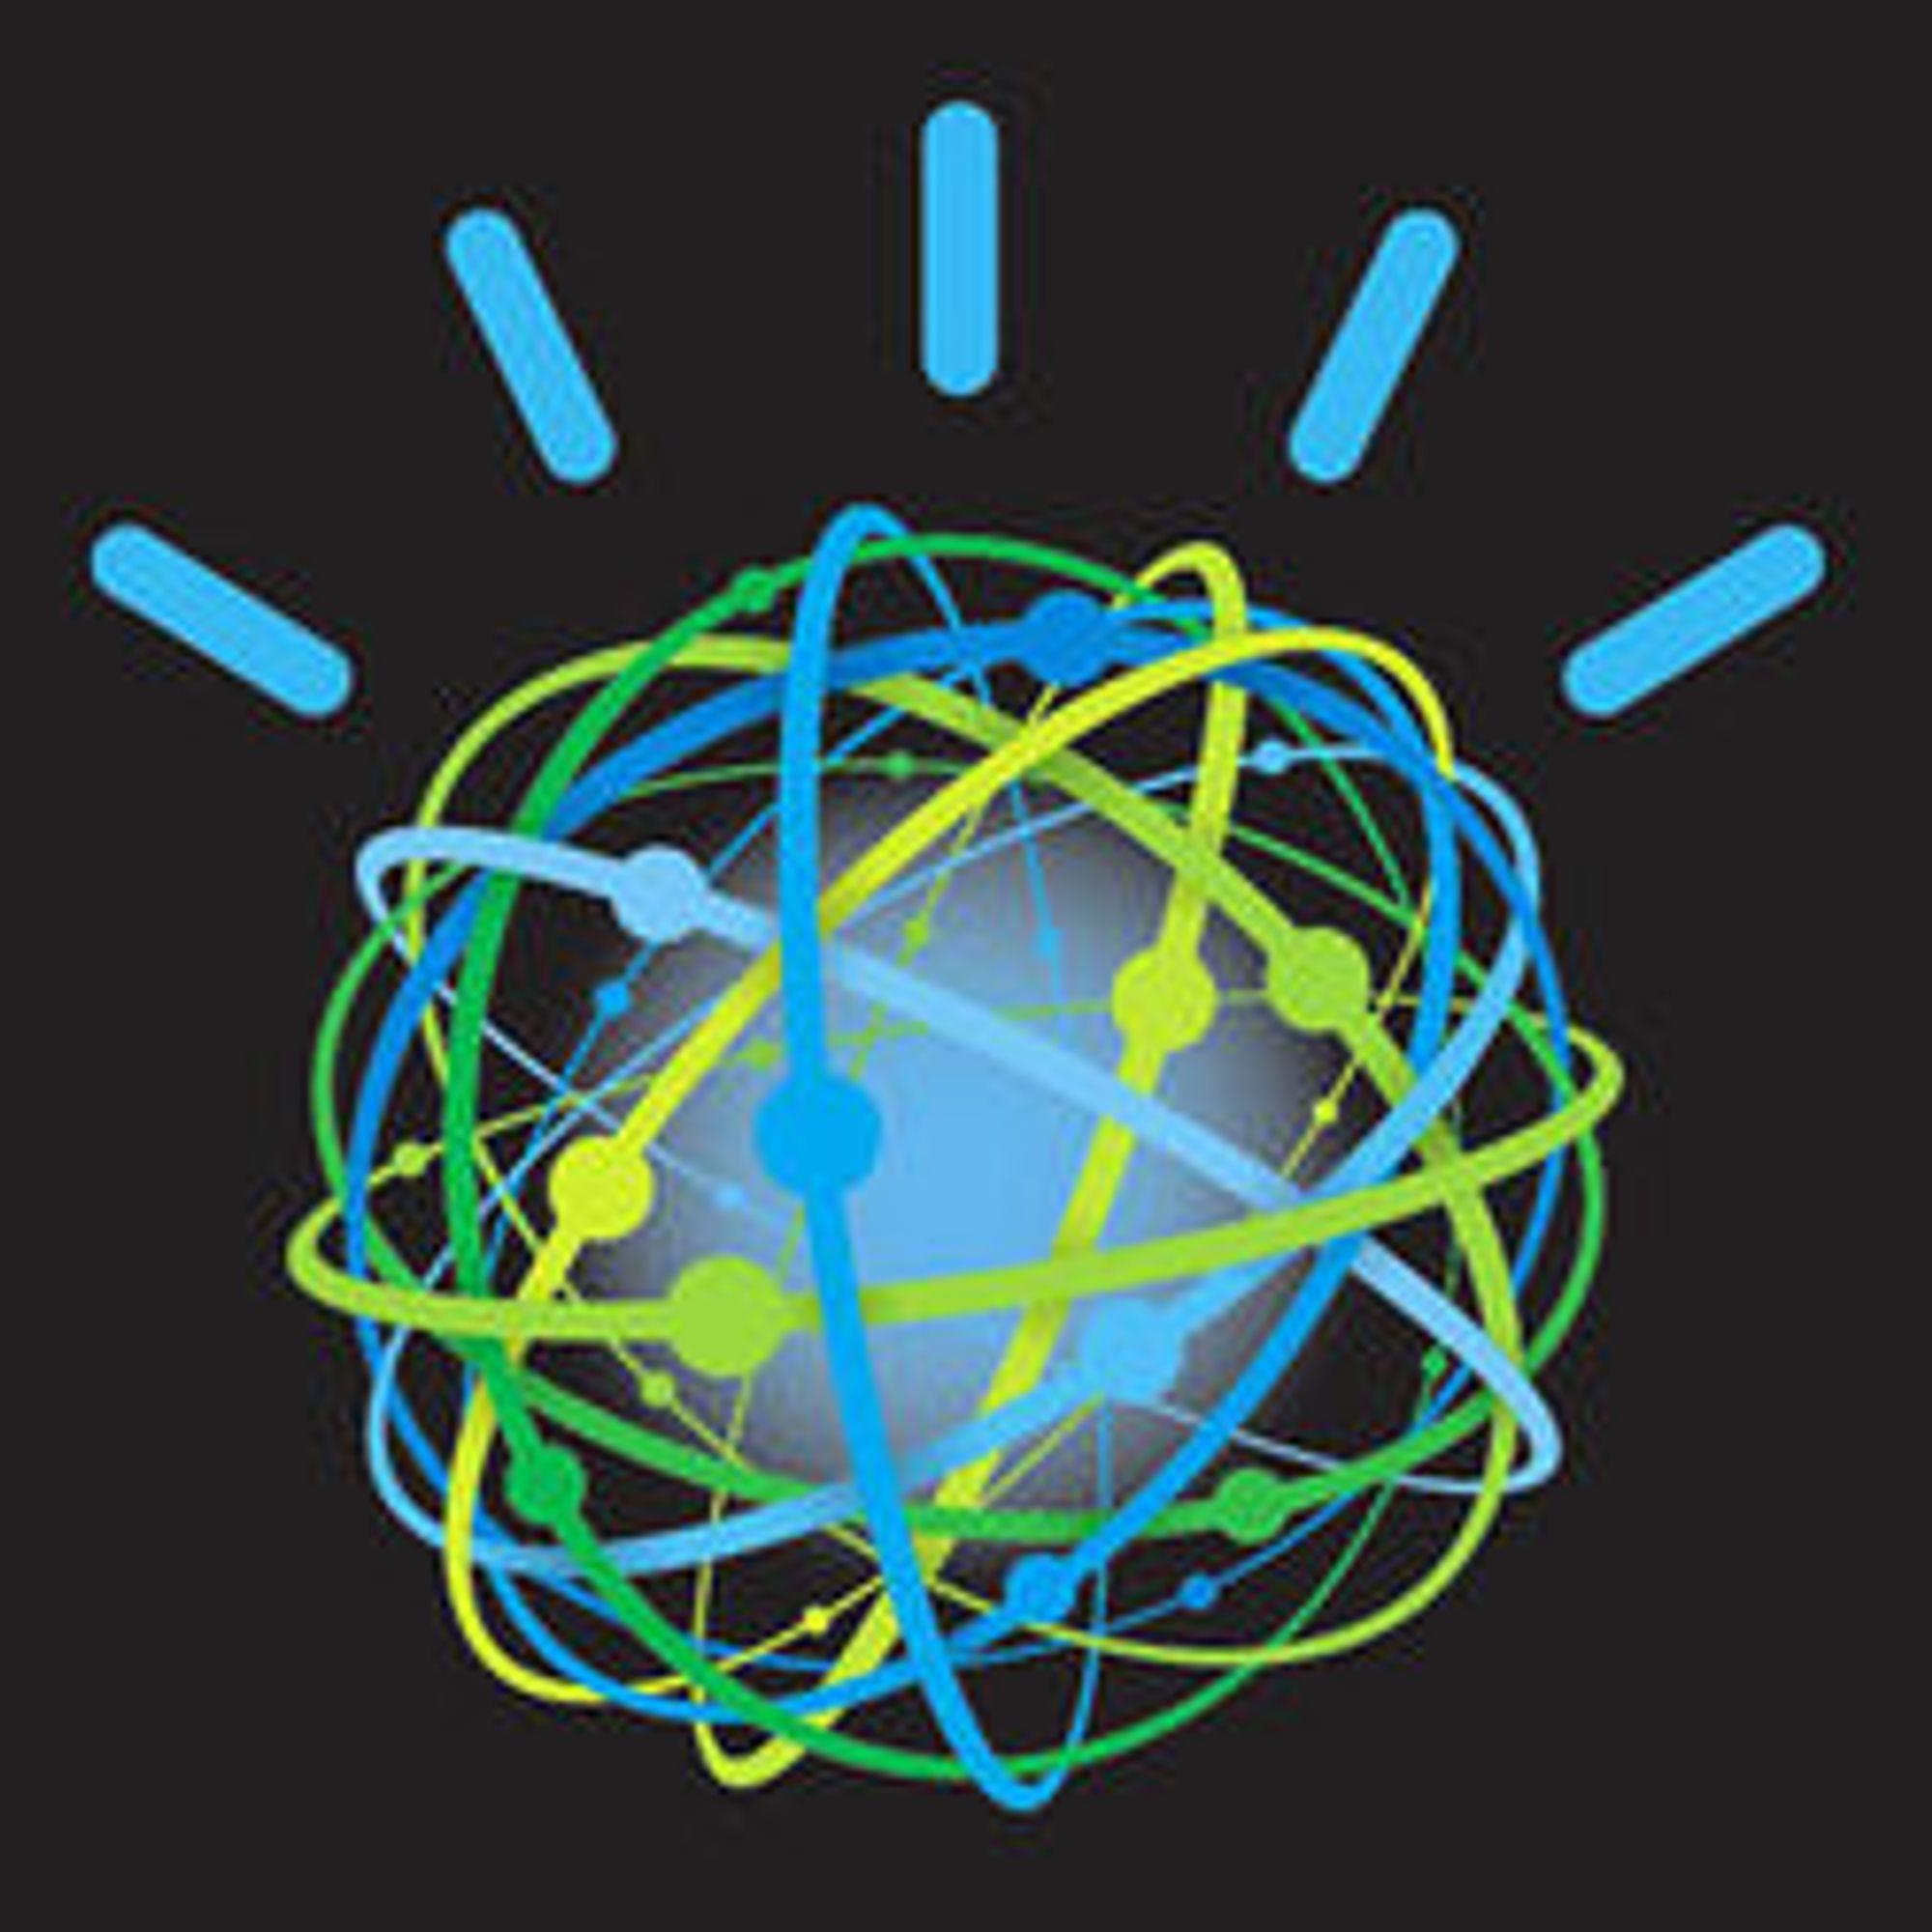 Denne logoen skal representere Watson under konkurransen.